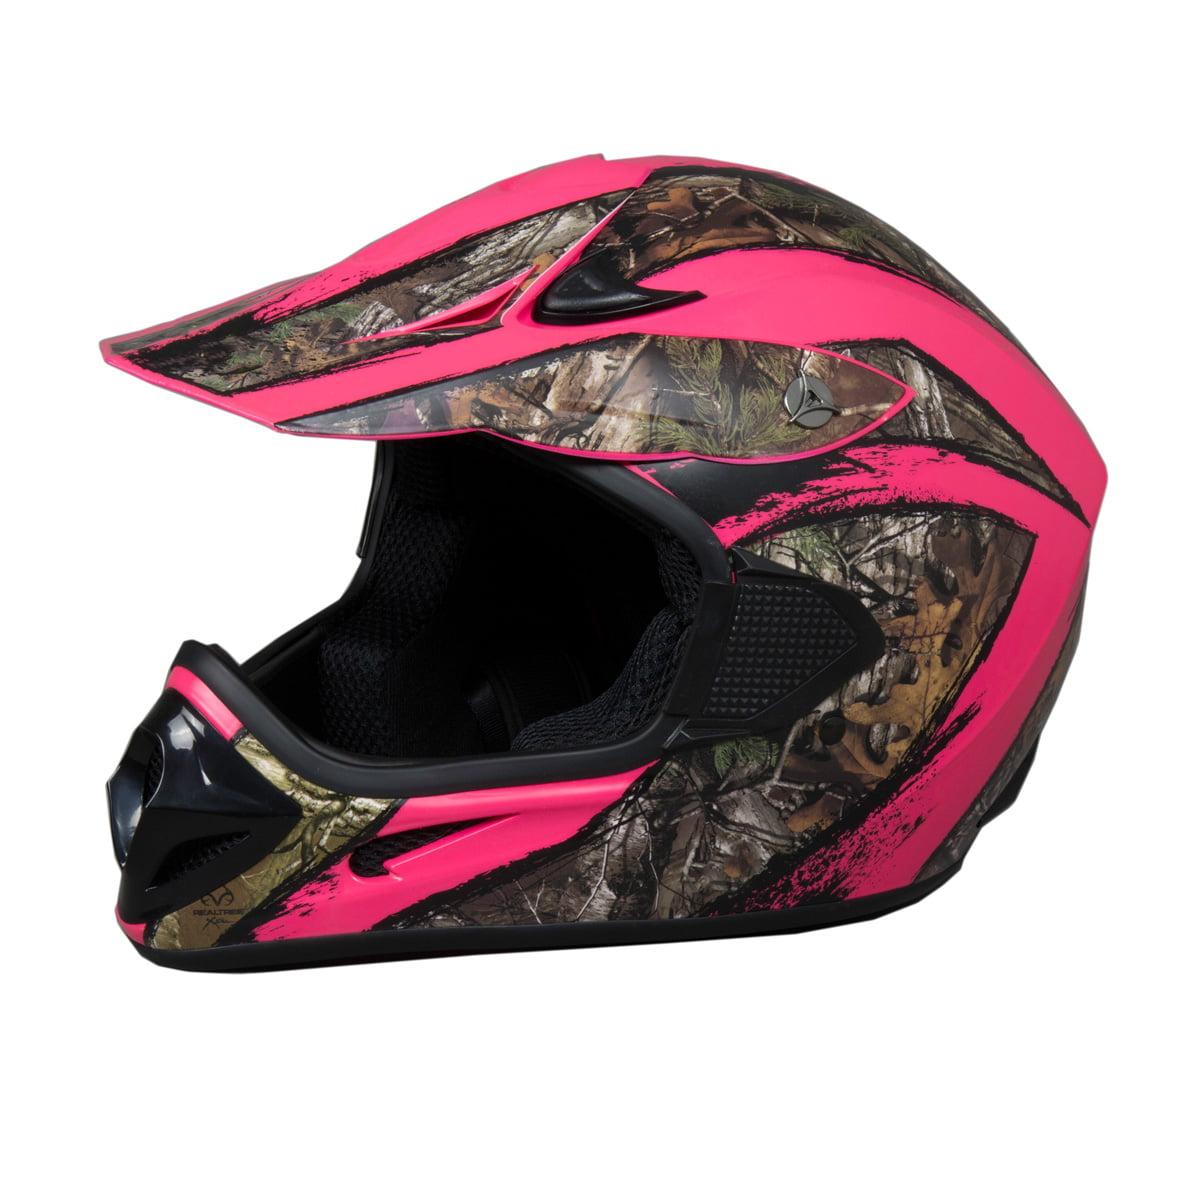 FUEL Adult MX / ATV Helmet Realtree Xtra Camo - DOT Appro...